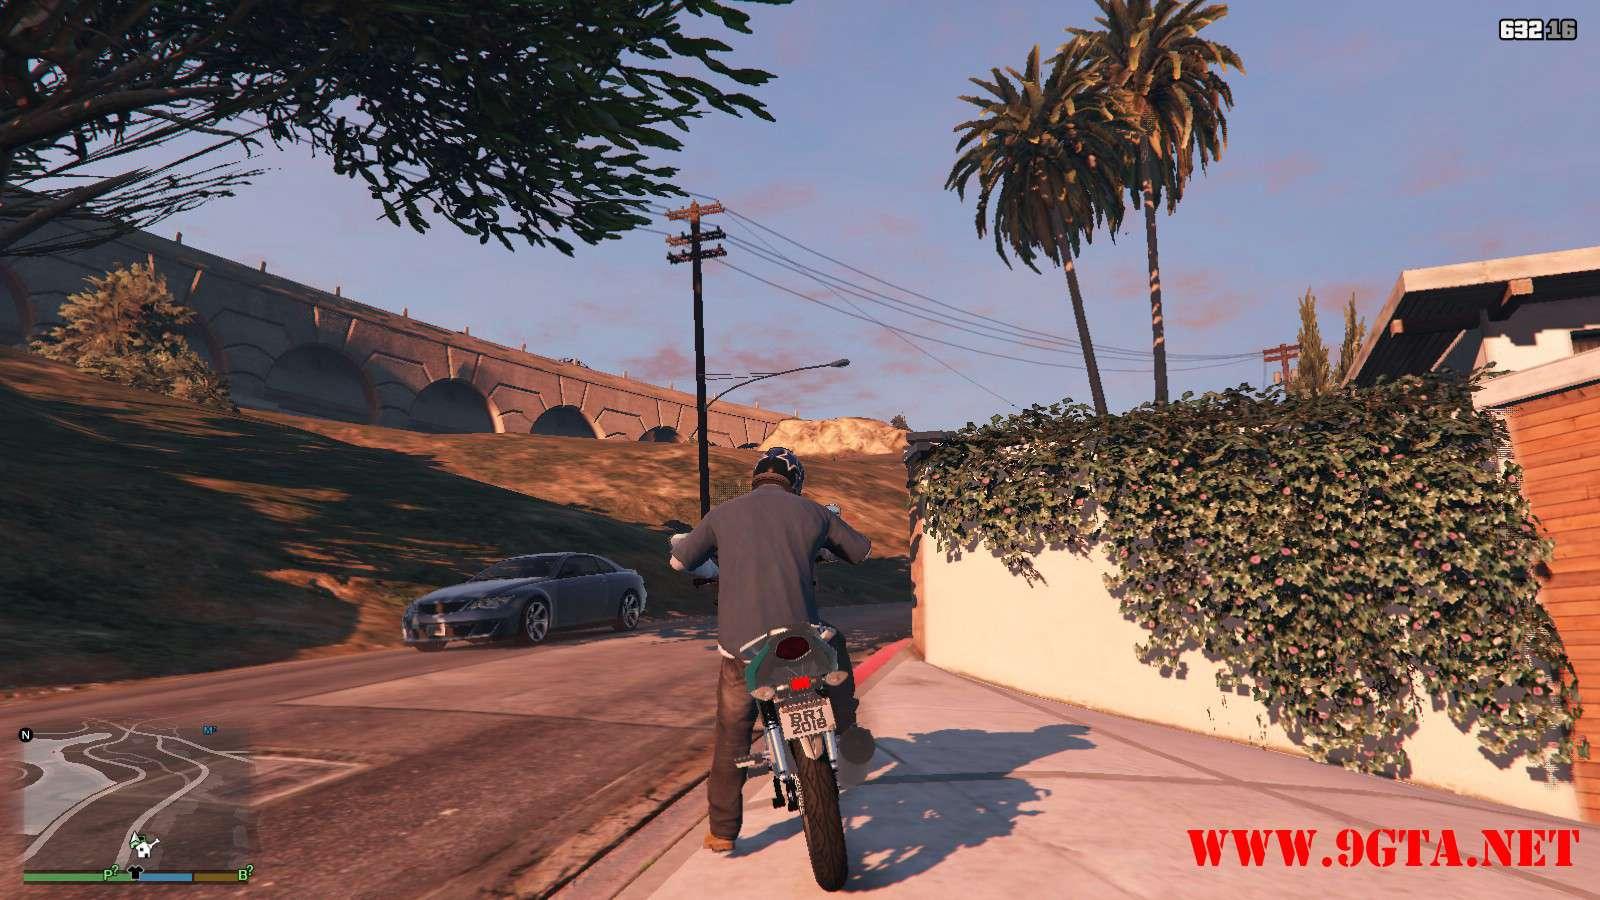 2016 Titan 160 Motocycle GTA5 Mods (3)